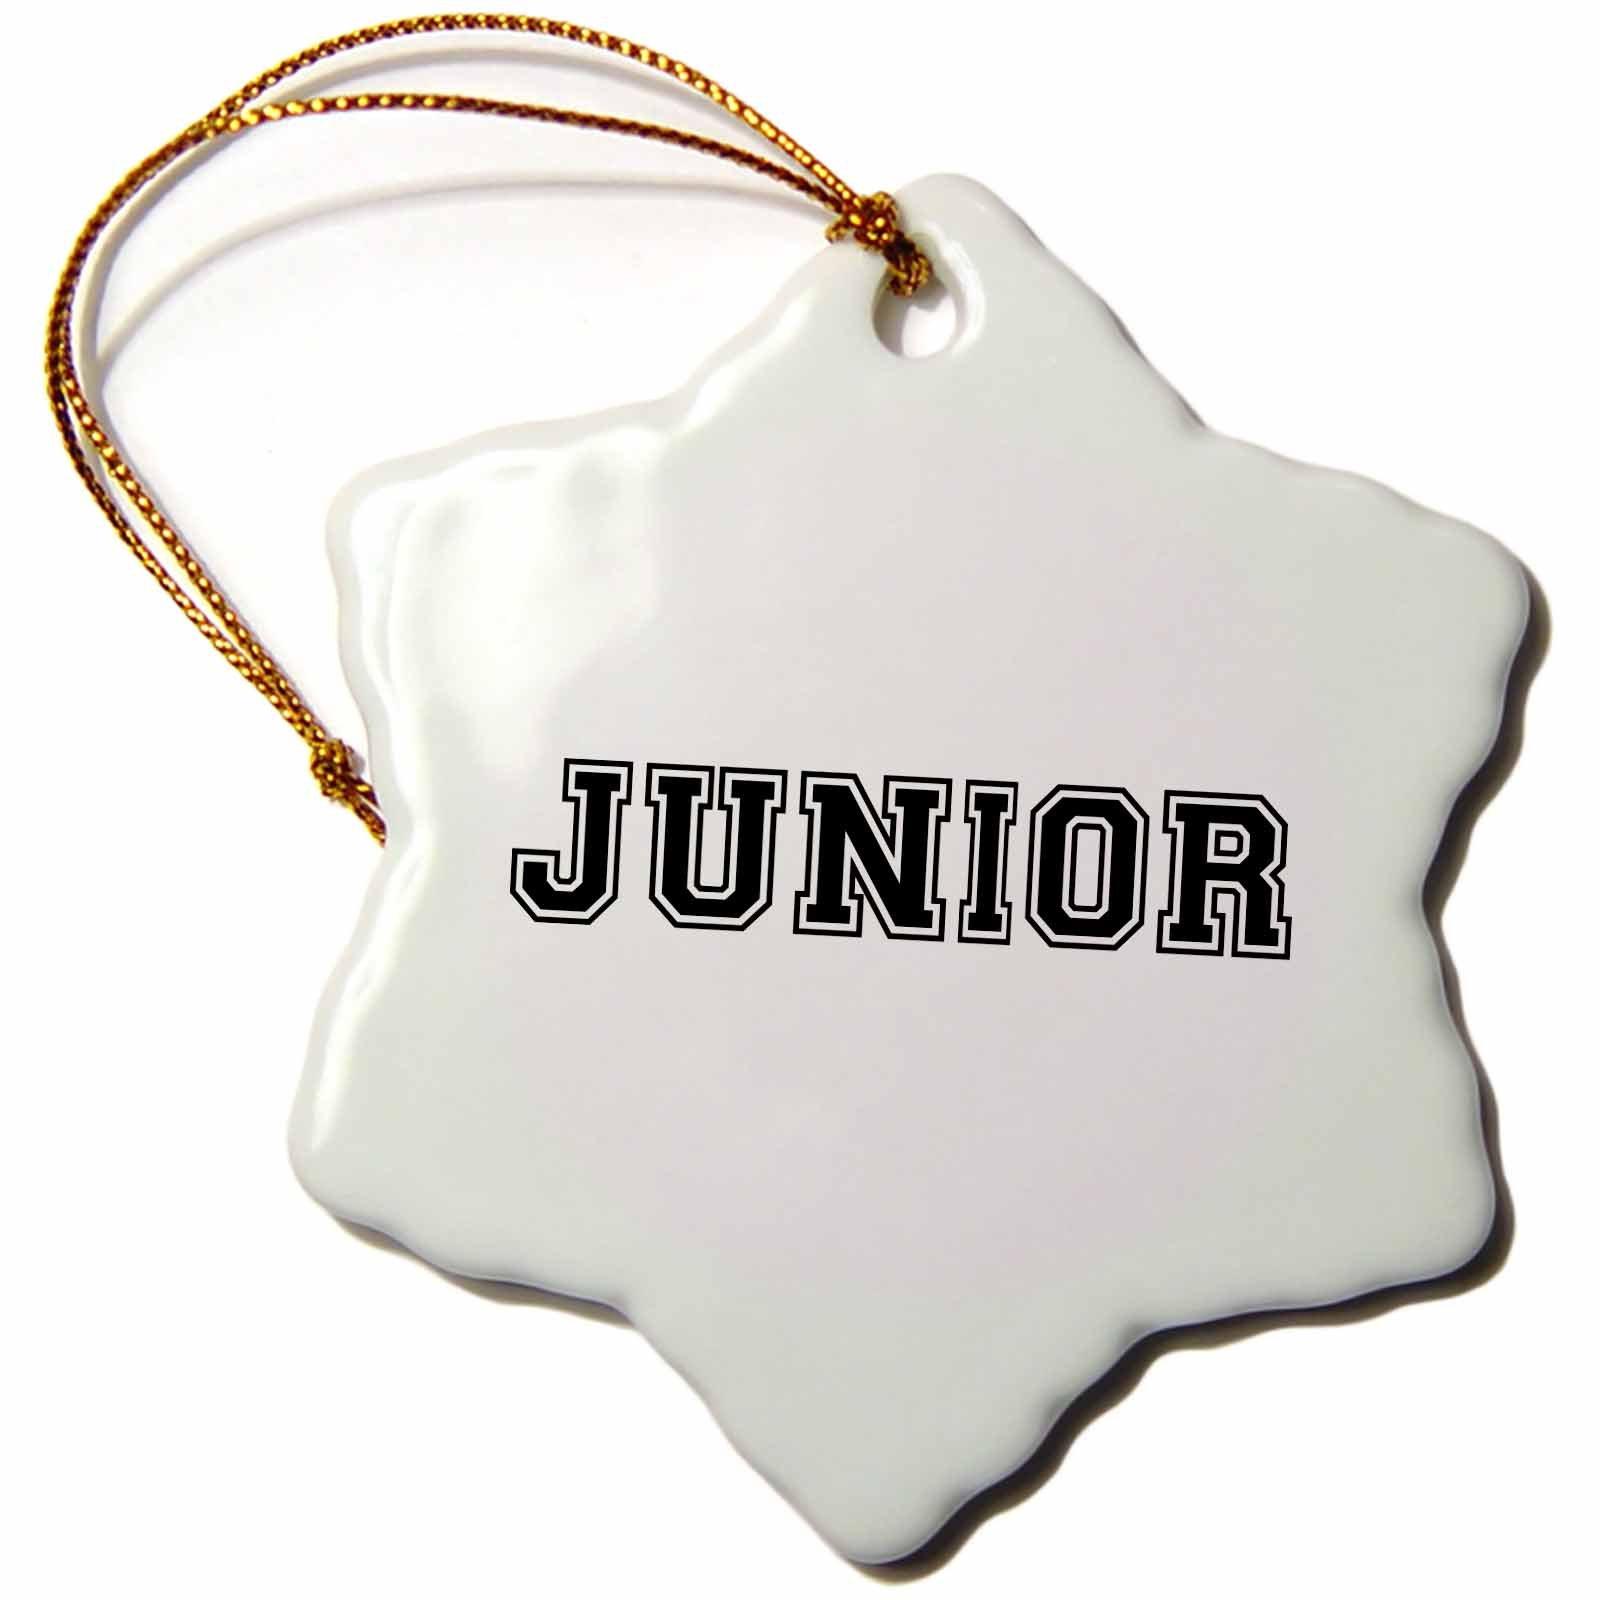 3dRose orn_151226_1 Junior-School Year Souvenir Jr Gift-Black Preppy Text-College High School Gifts-Snowflake Ornament, 3-Inch, Porcelain